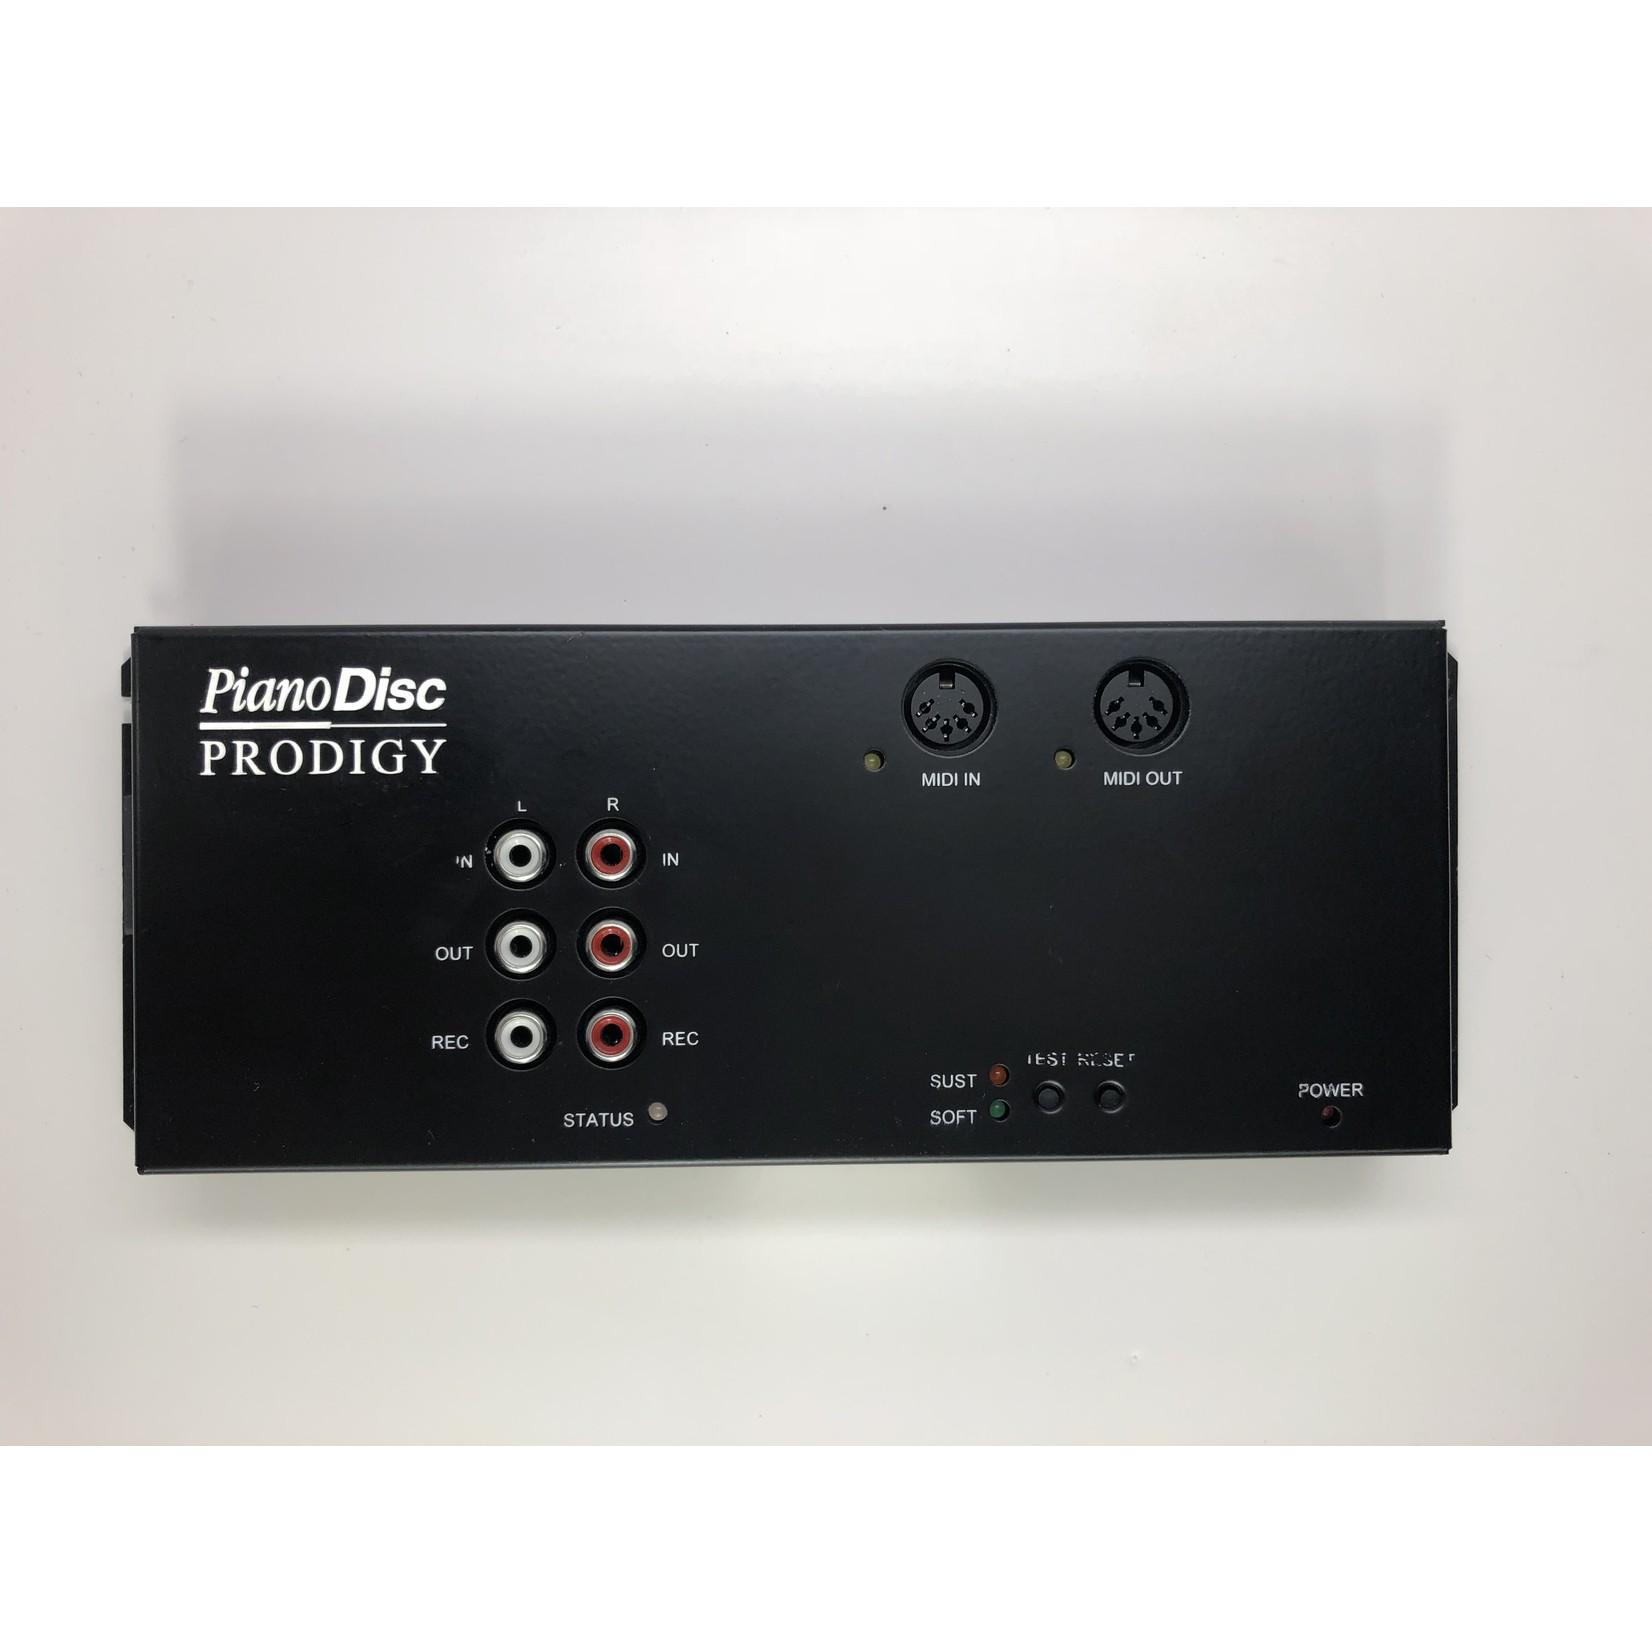 PianoDisc SD-1 upgrade für Prodigy